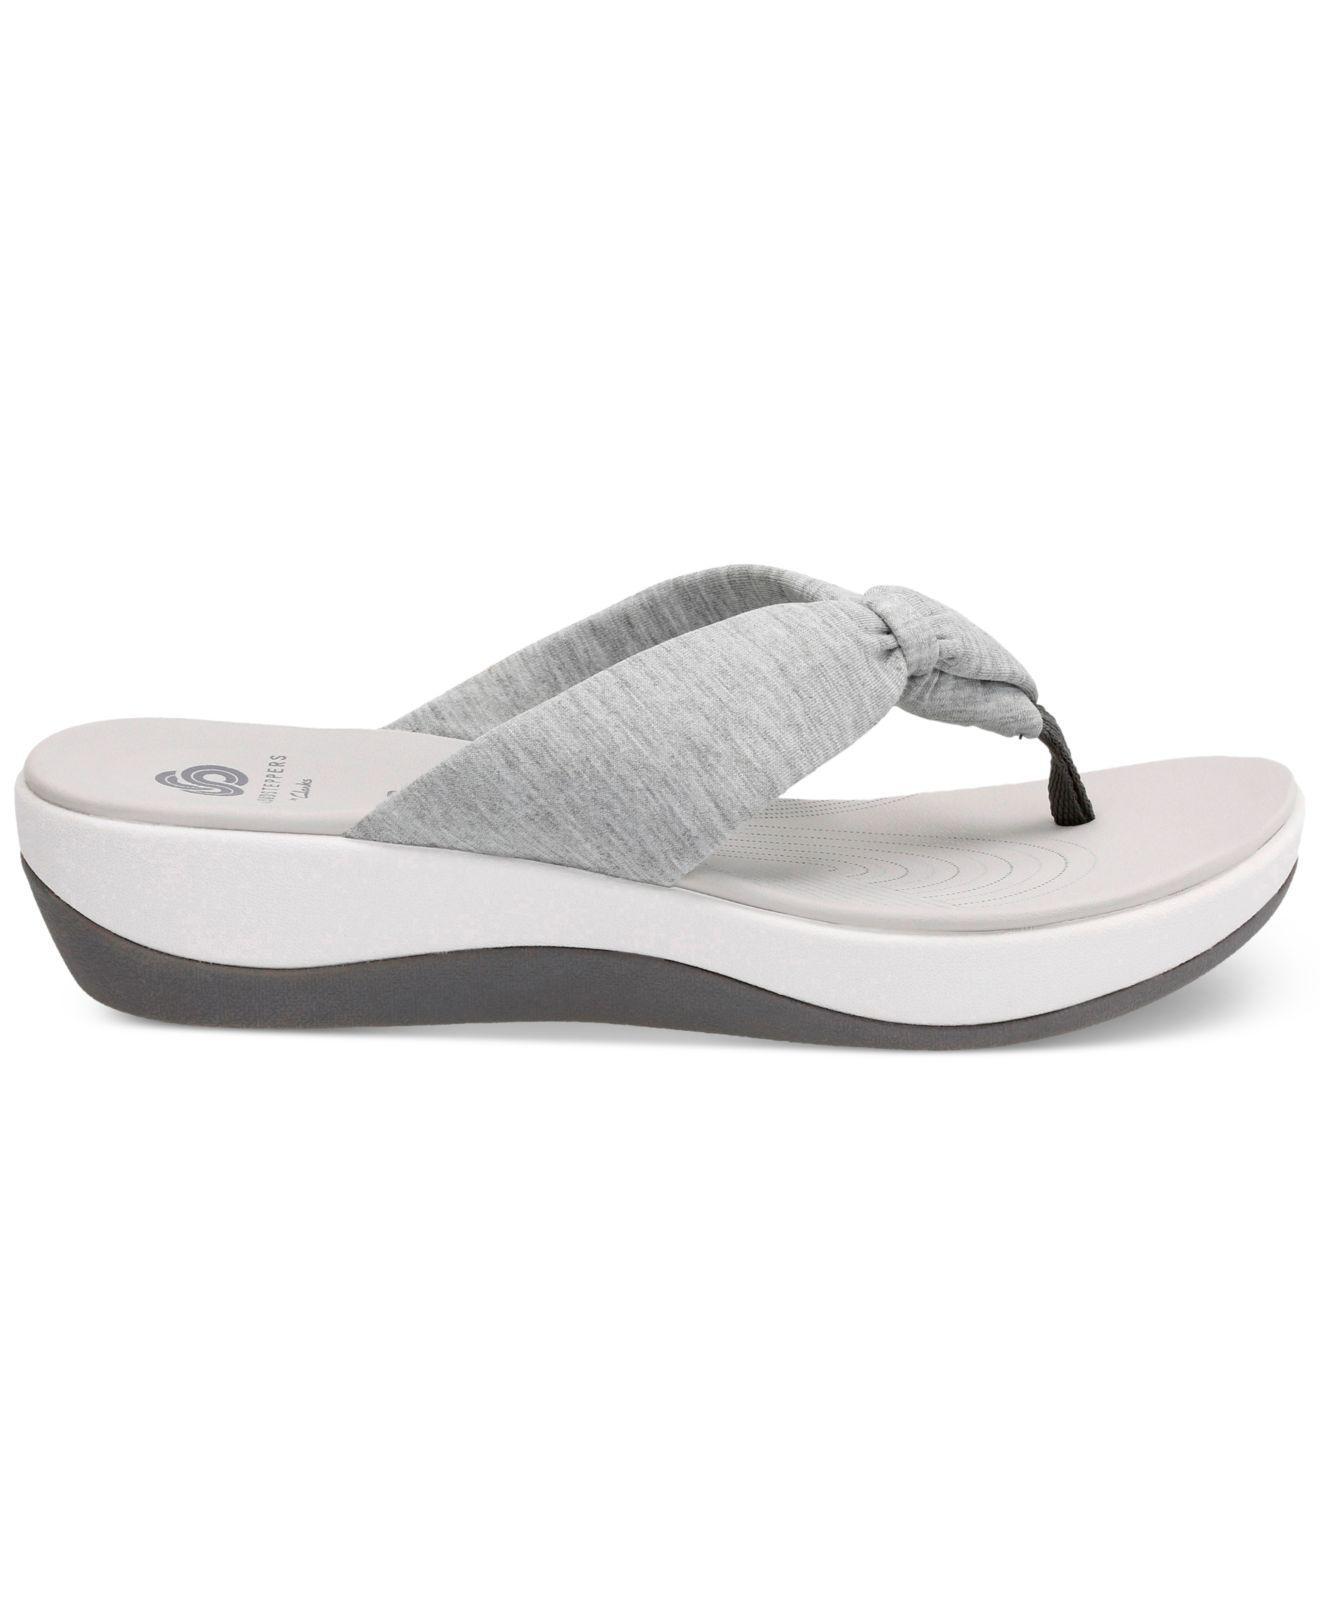 739e368feb11 Lyst - Clarks Arla Gilson Flip Flops in Gray - Save 27%